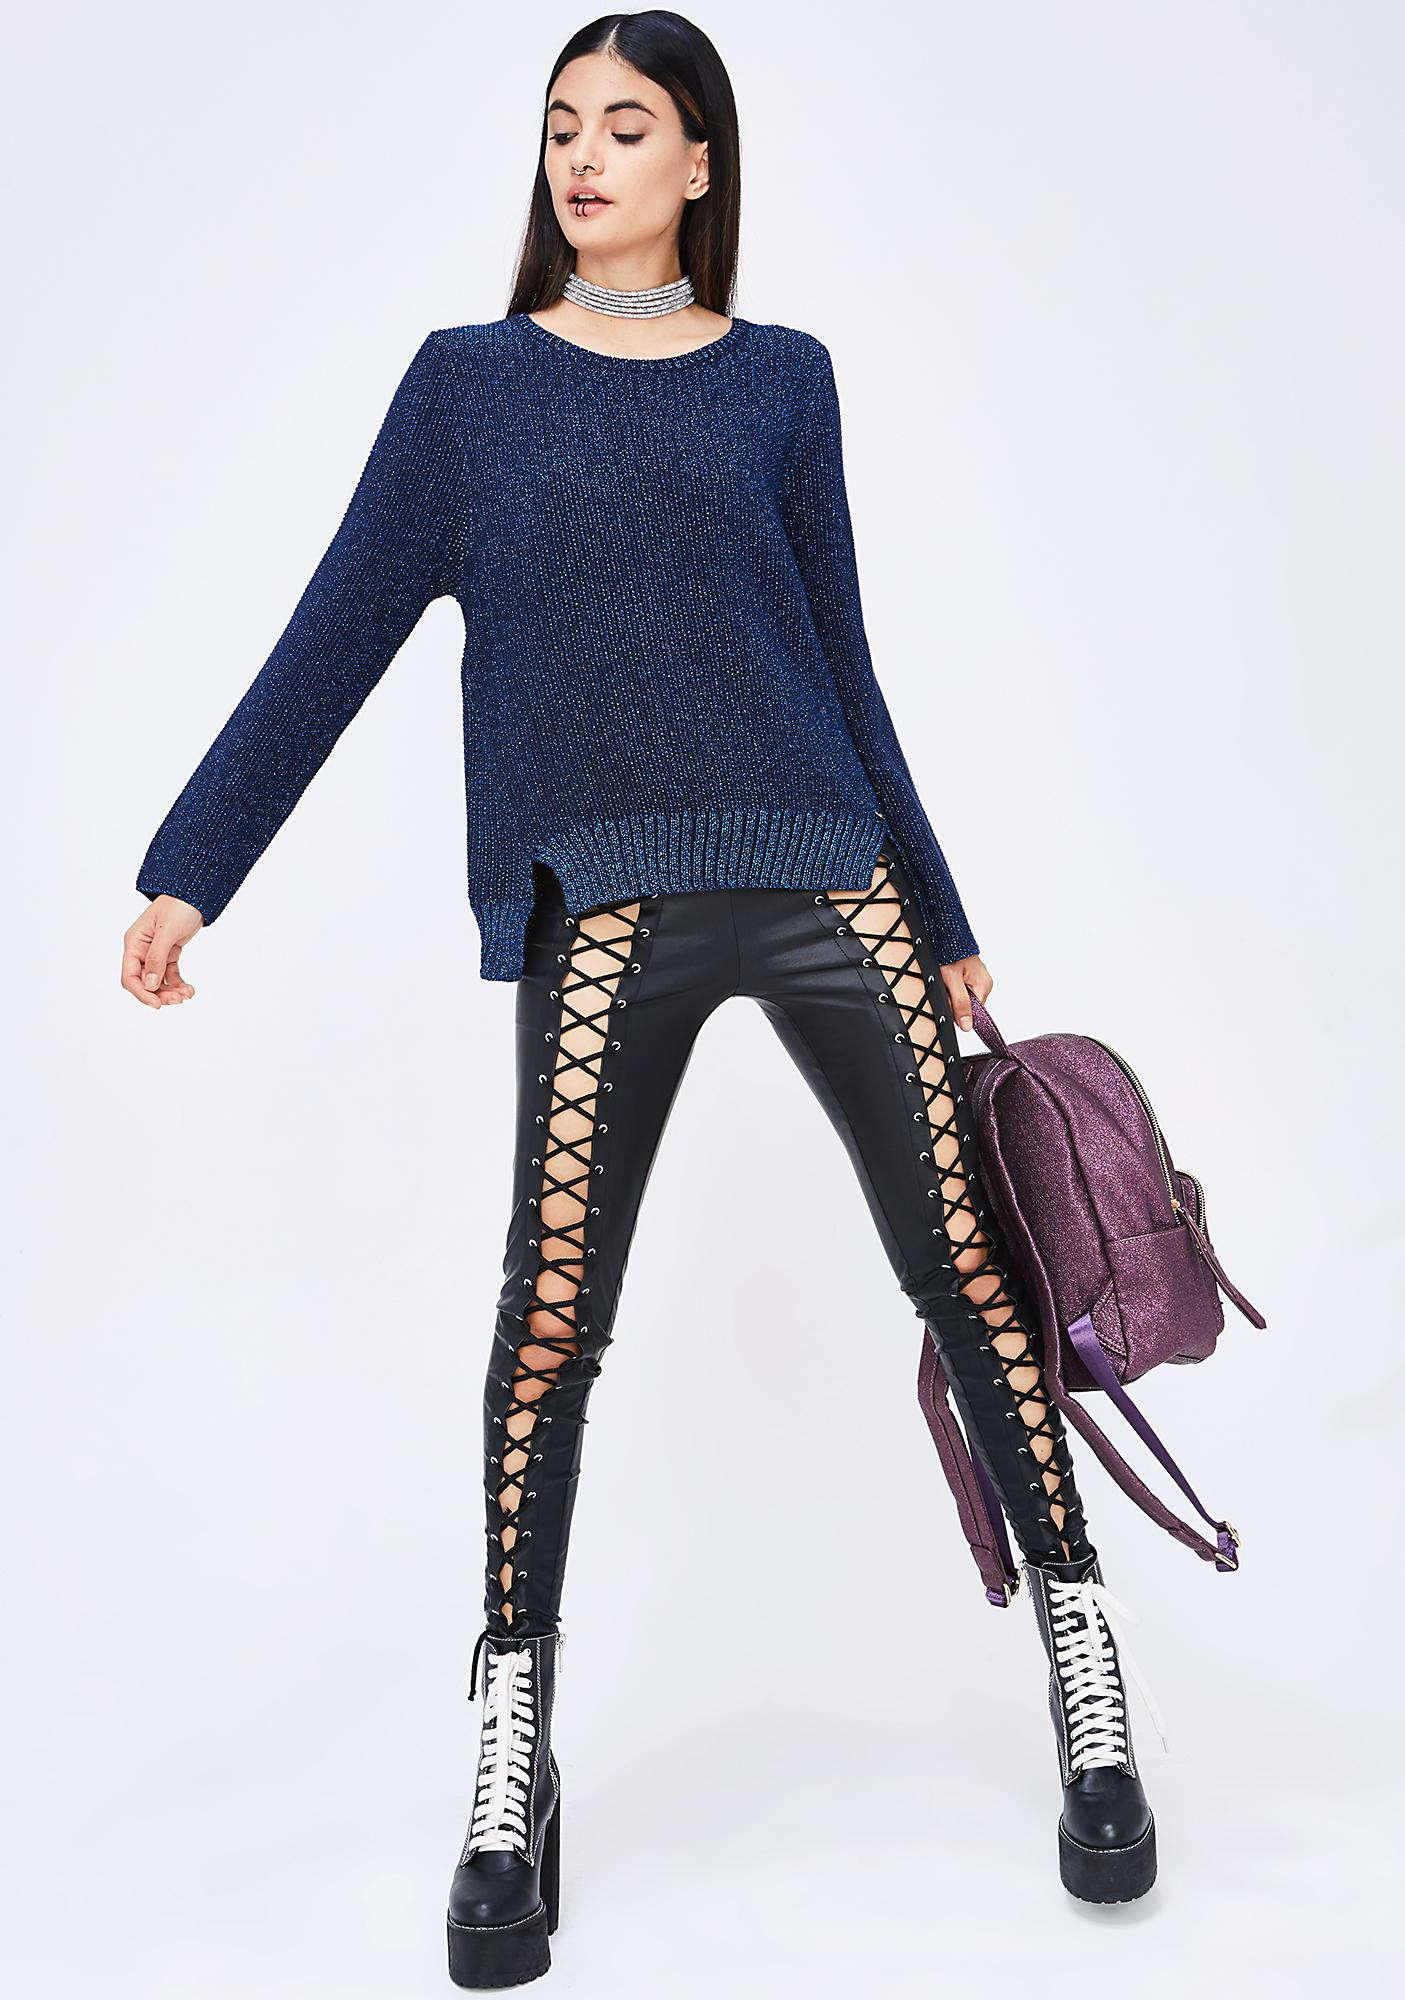 Warm Feelings Sparkly Sweater